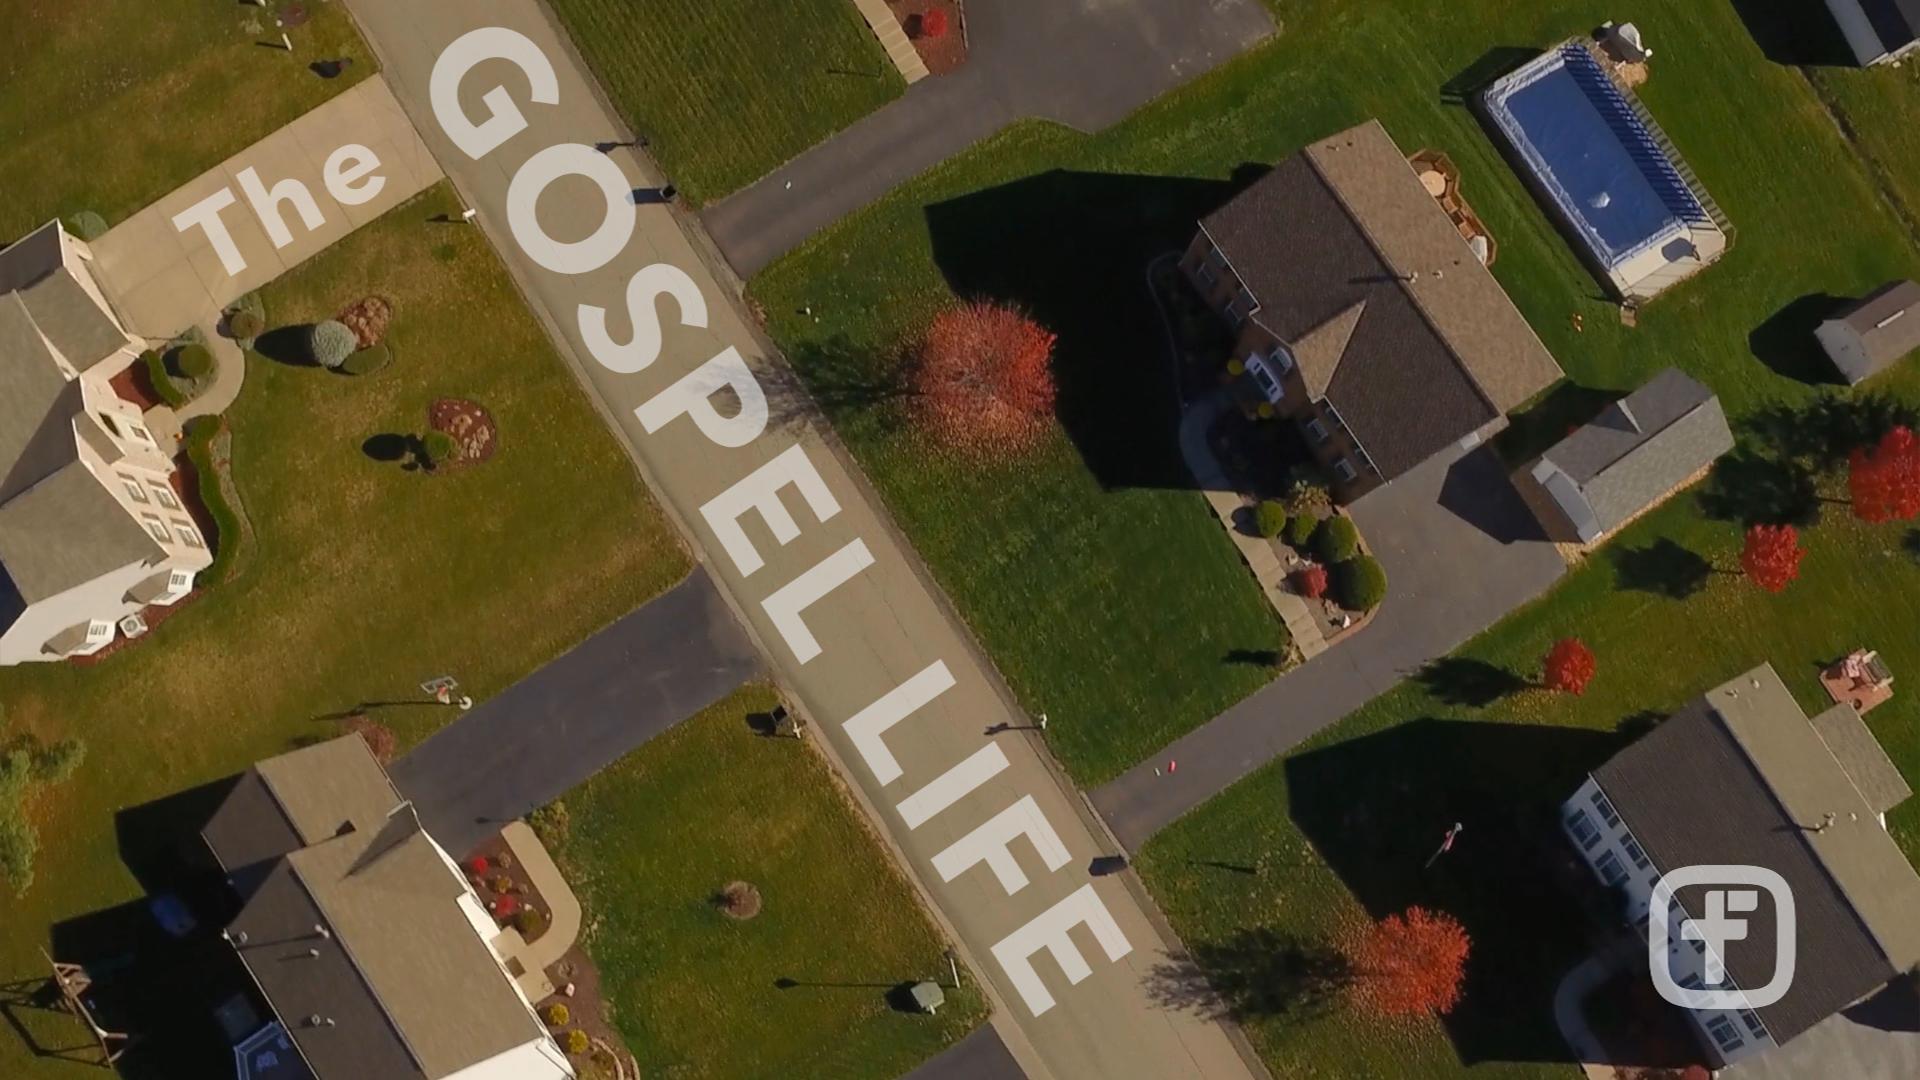 GospelLifeTitle.png